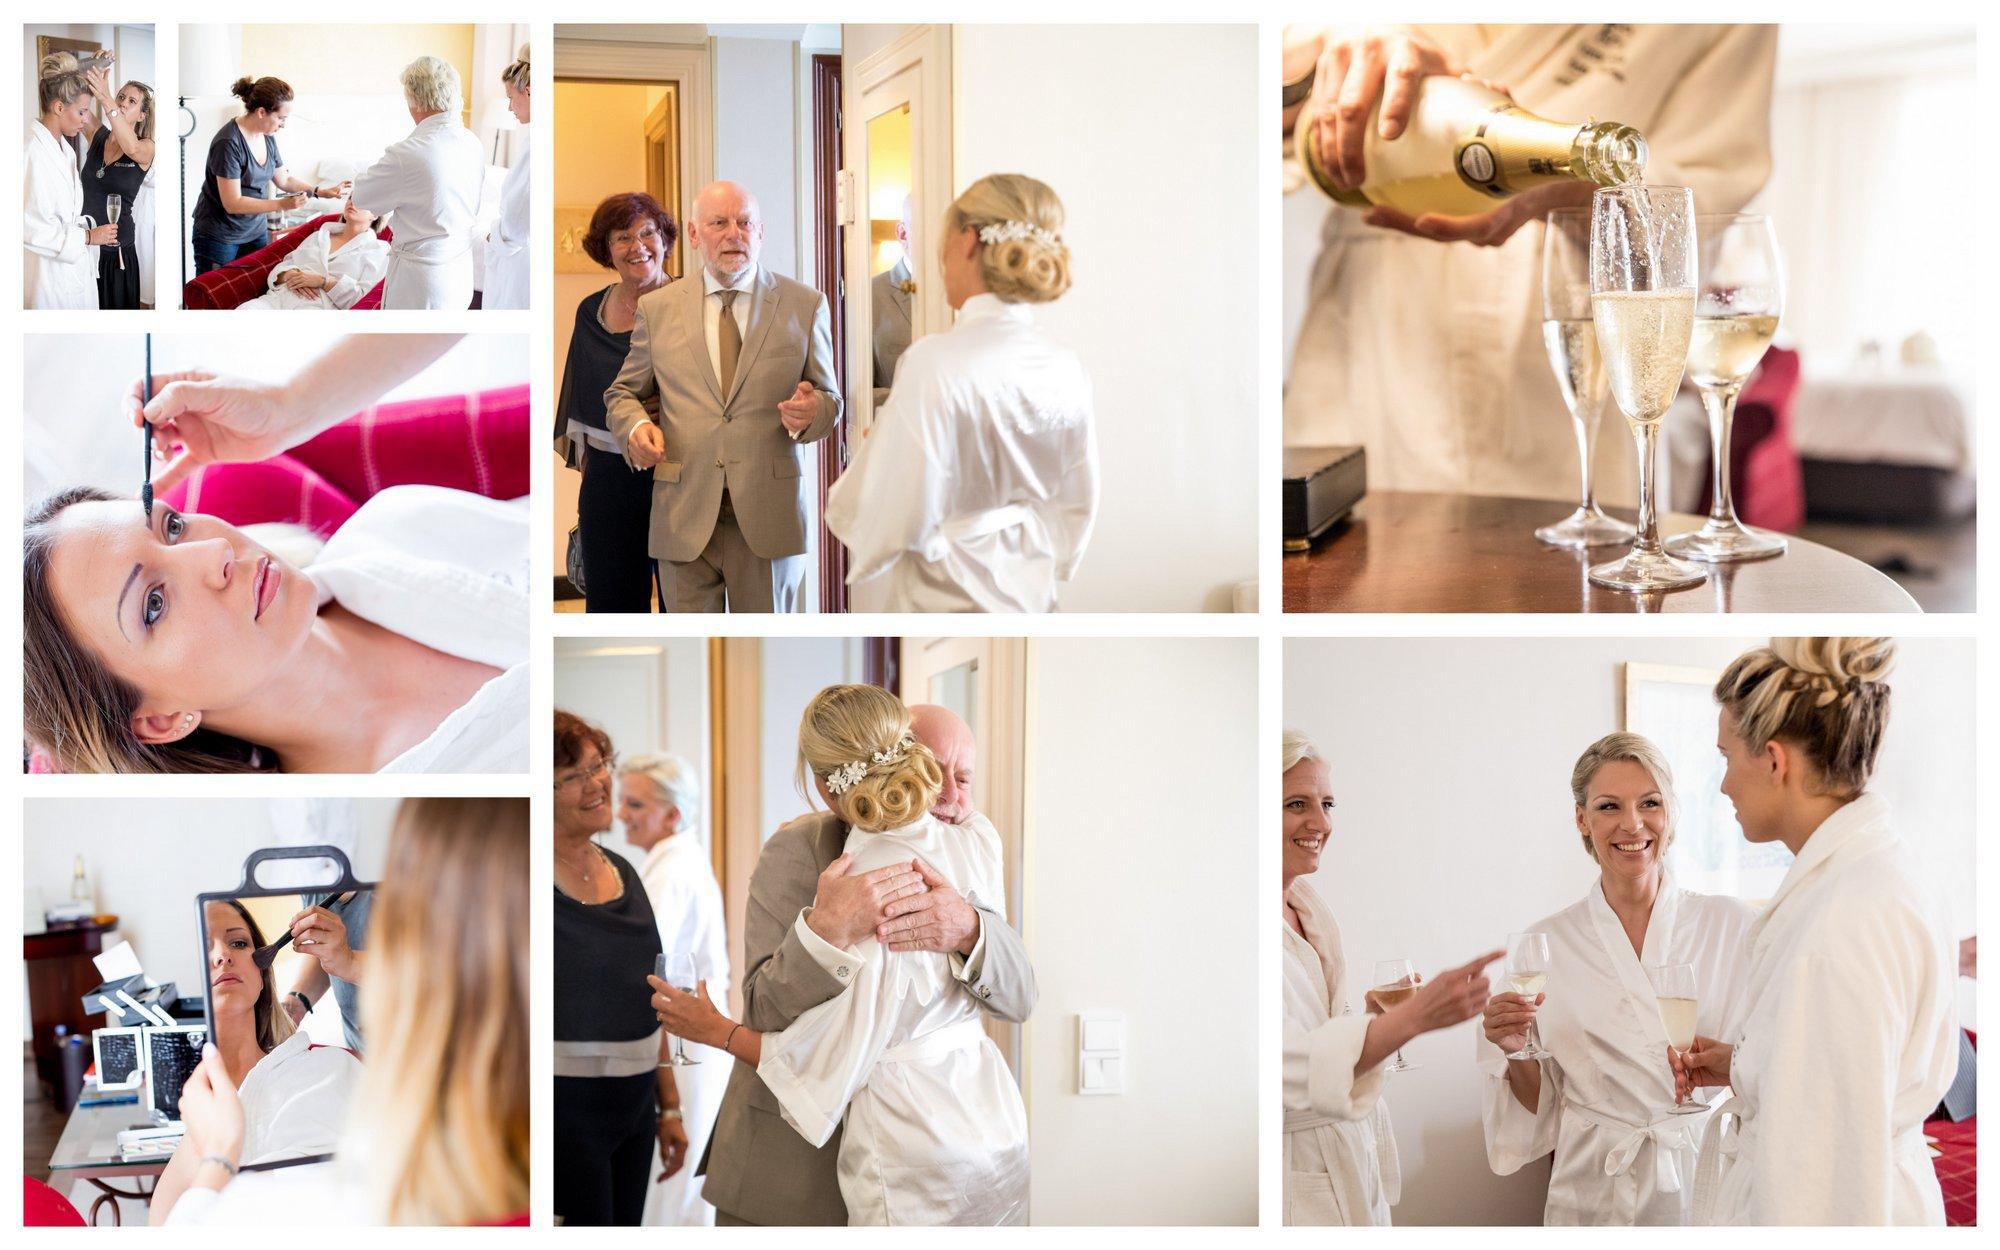 photography kempinski wedding marbella